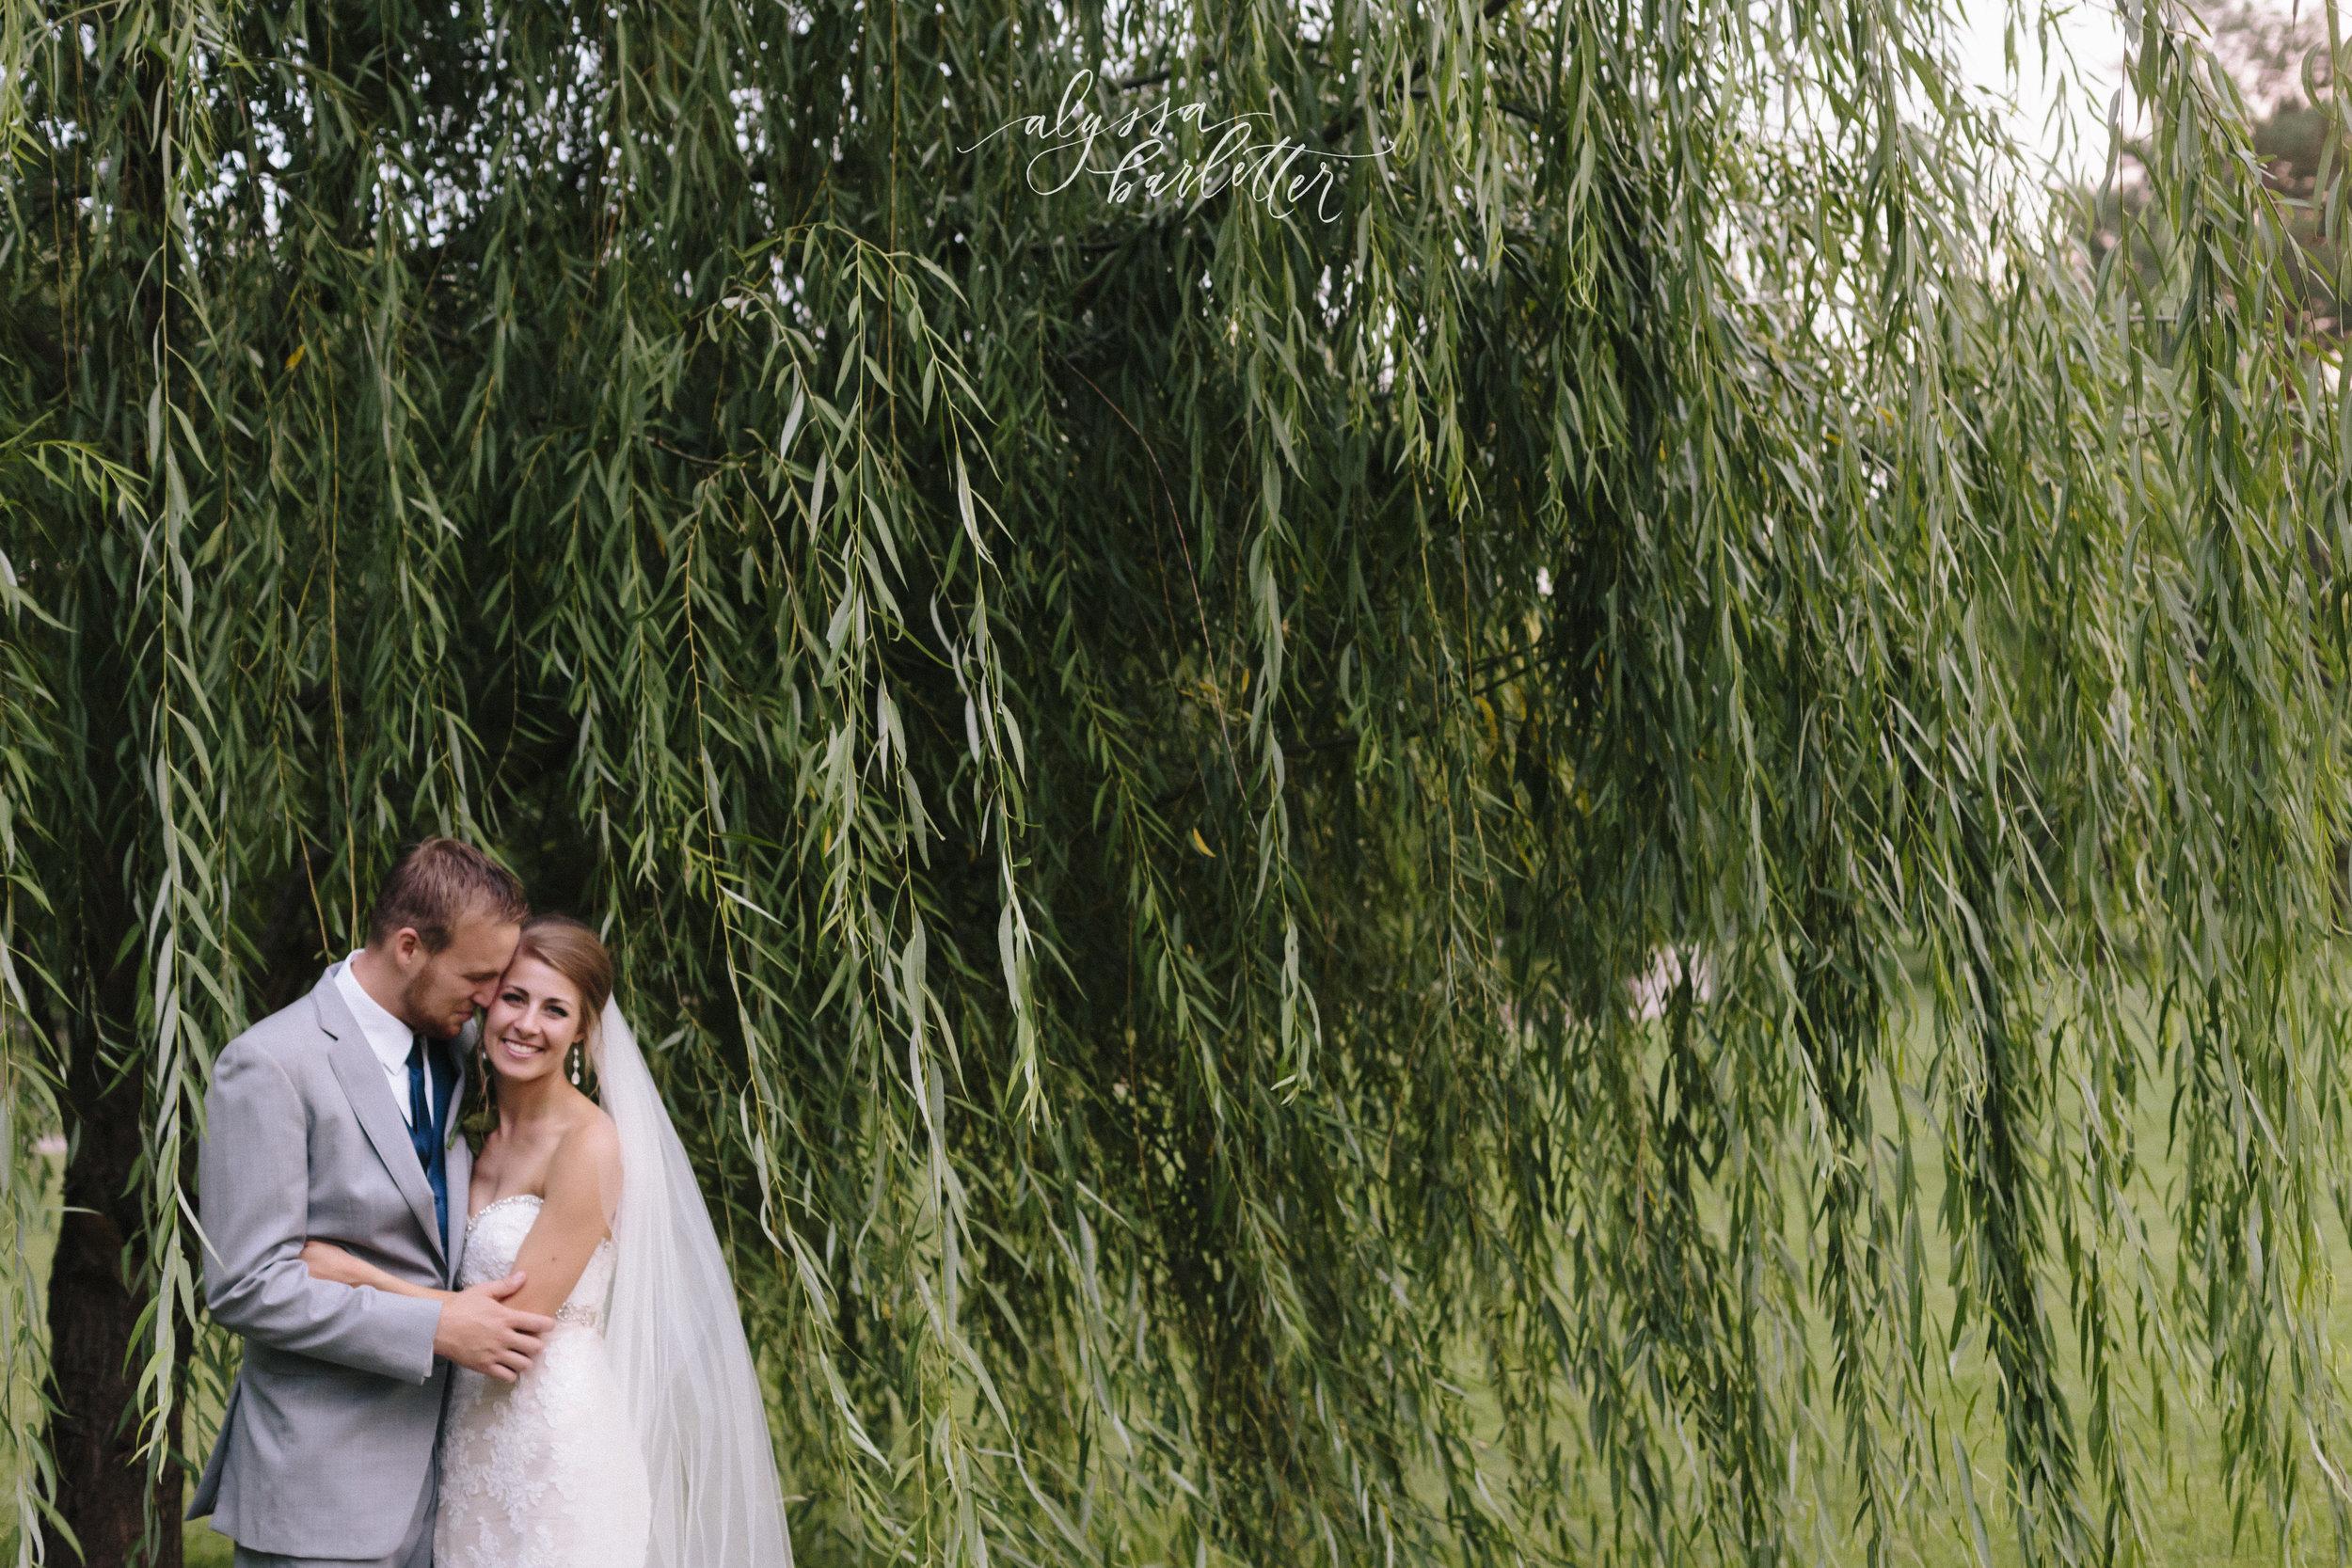 kansas city wedding photographer loose park bride groom bridesmaids groomsmen bridal party portraits